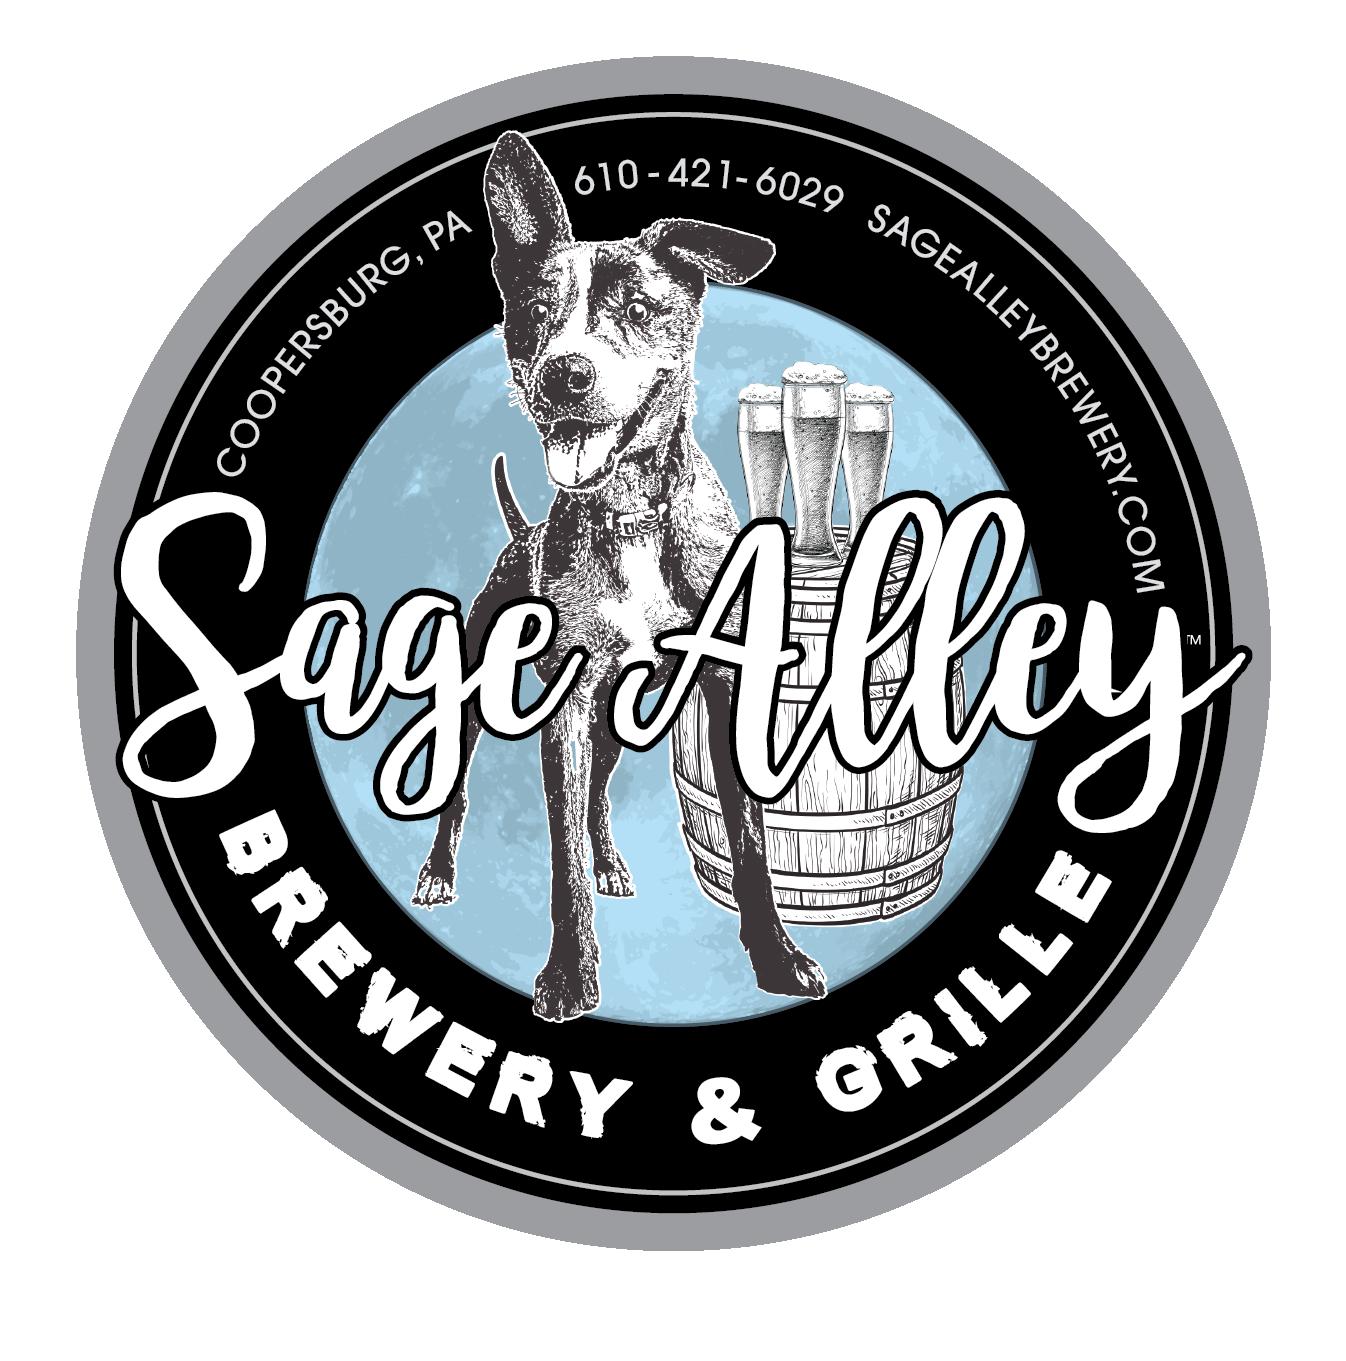 Sage Alley Brewery & Grille